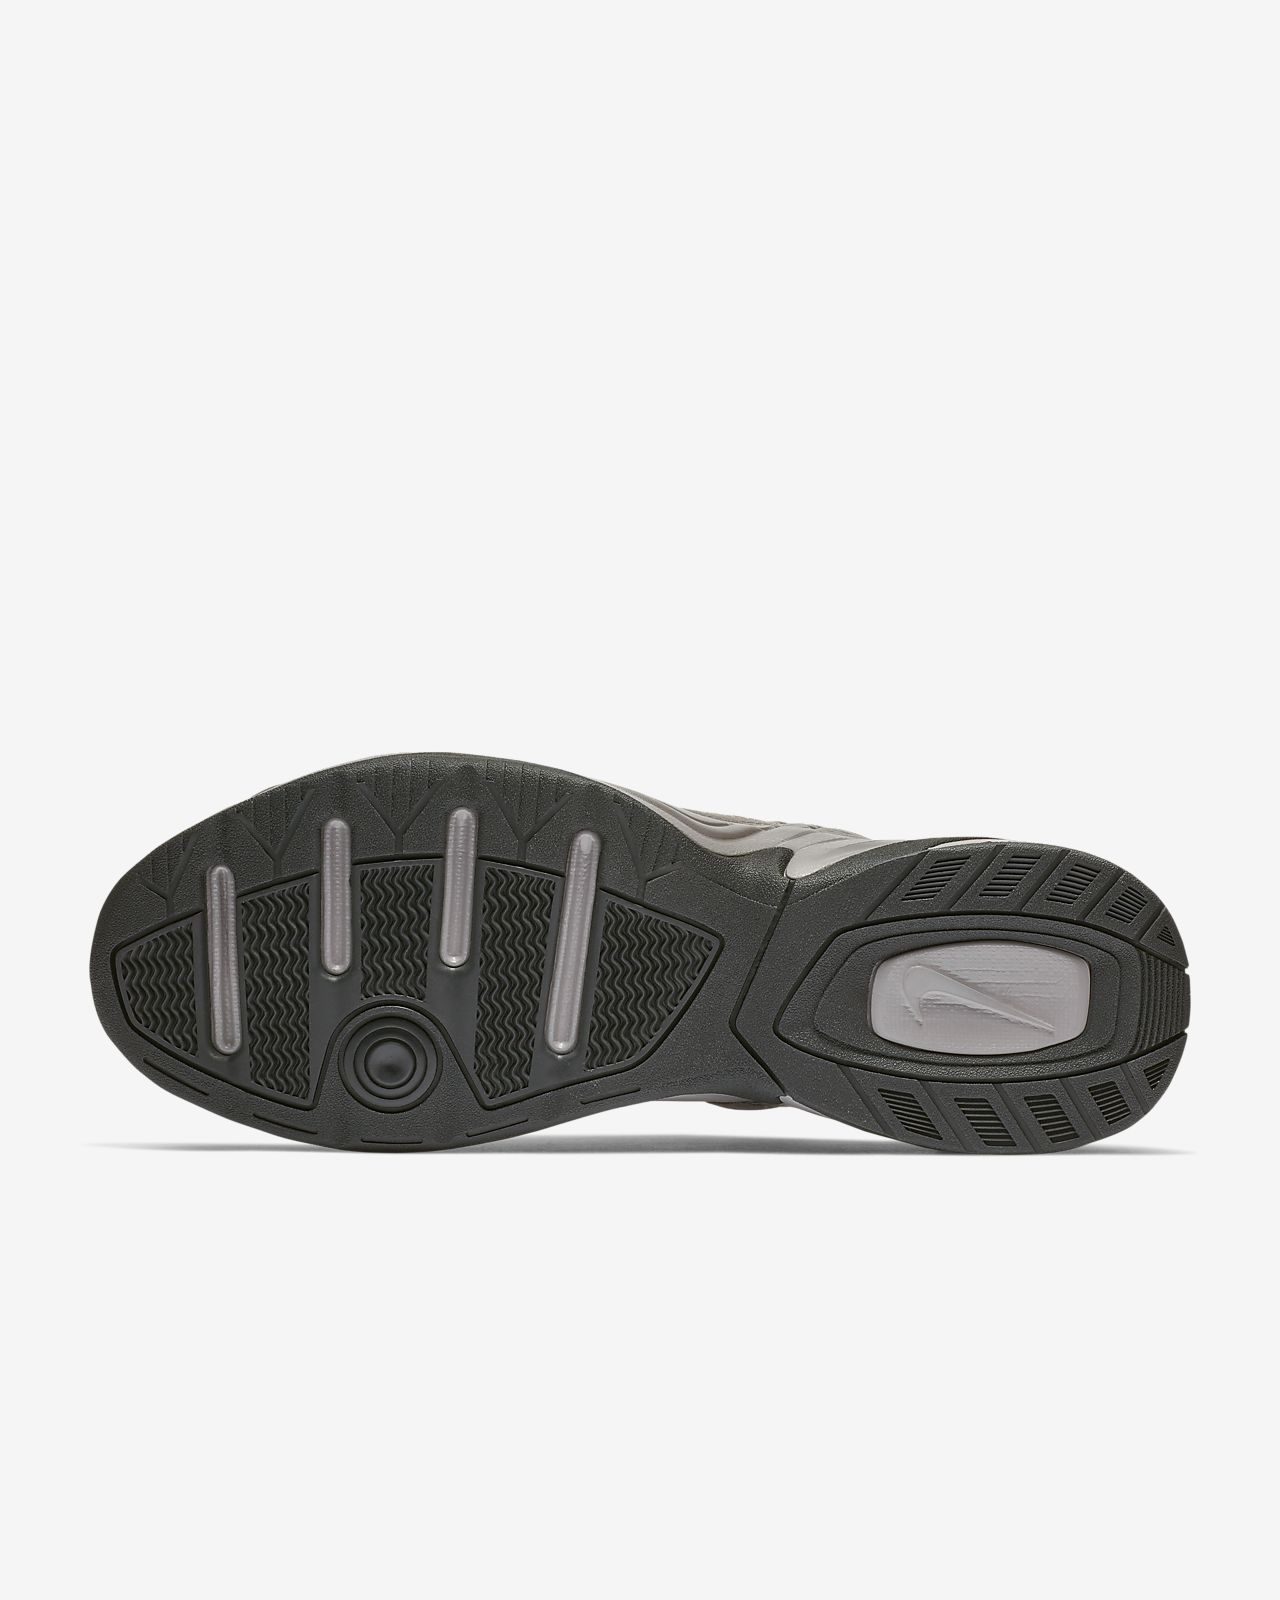 sports shoes 8c52a d2a82 ... Nike M2K Tekno SP Herenschoen